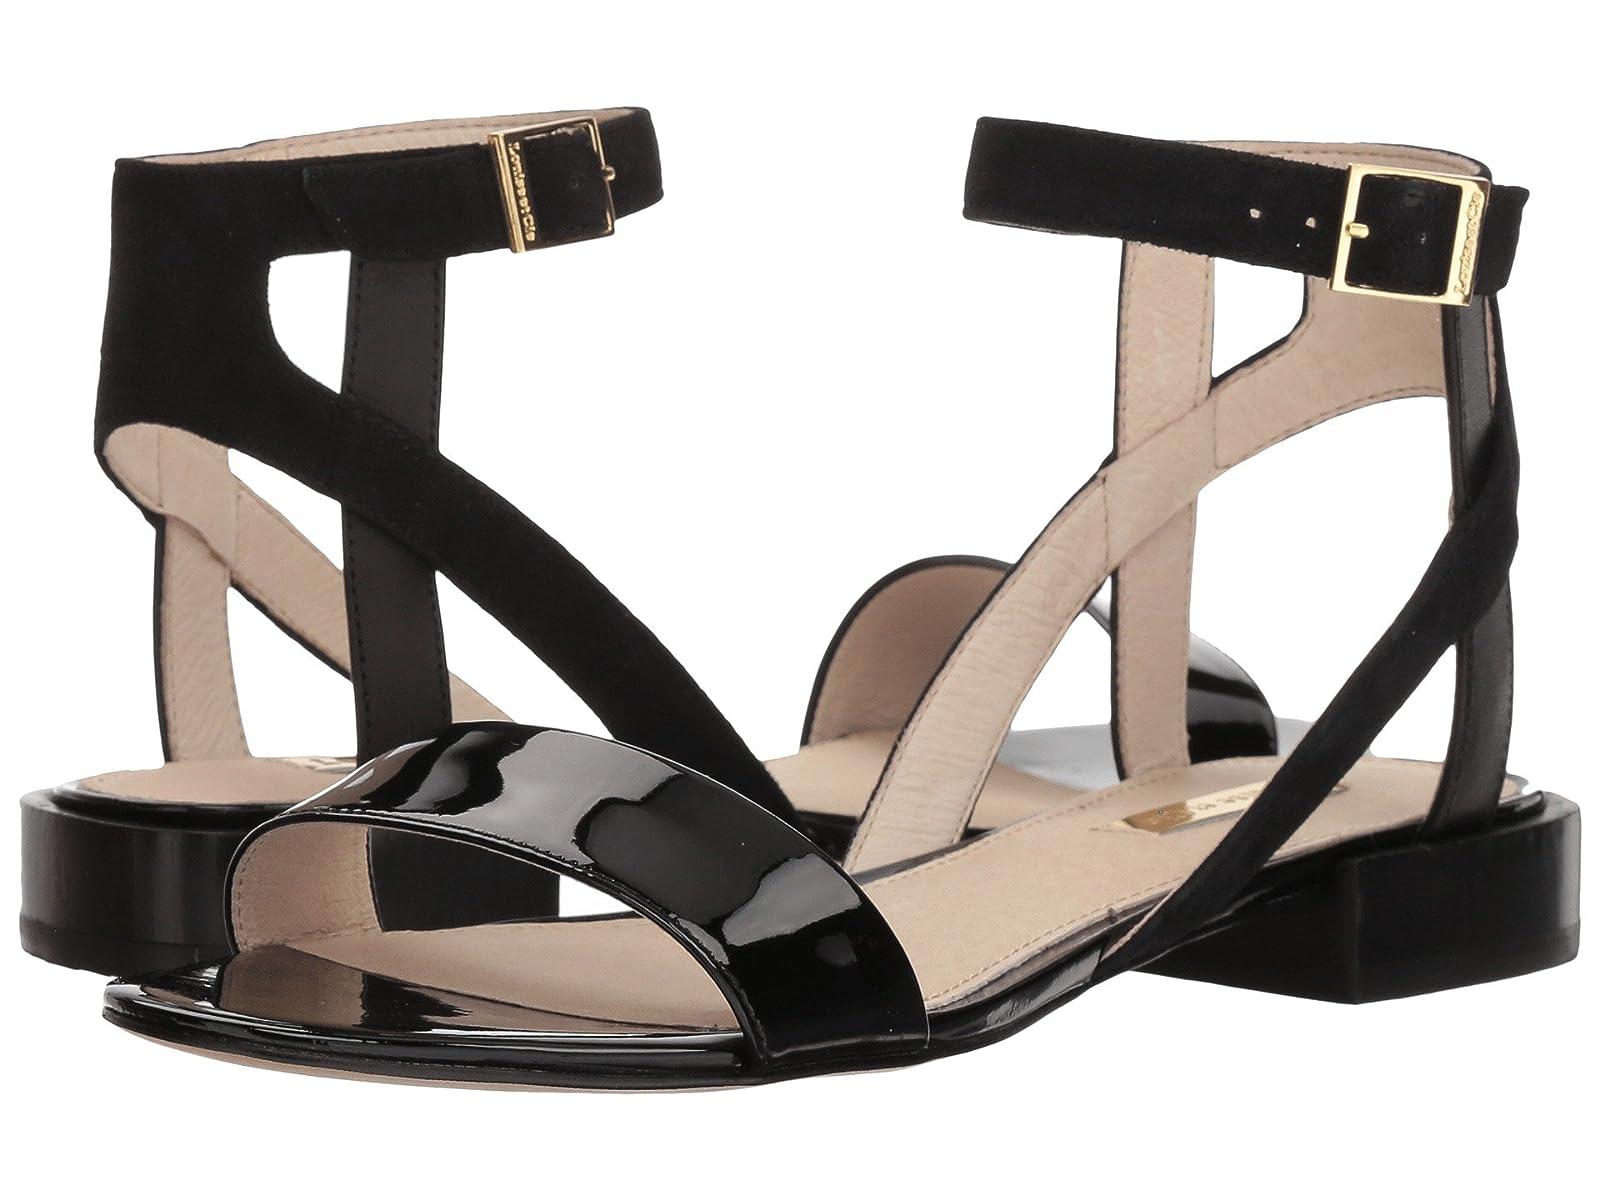 Louise et Cie AlessaCheap and distinctive eye-catching shoes